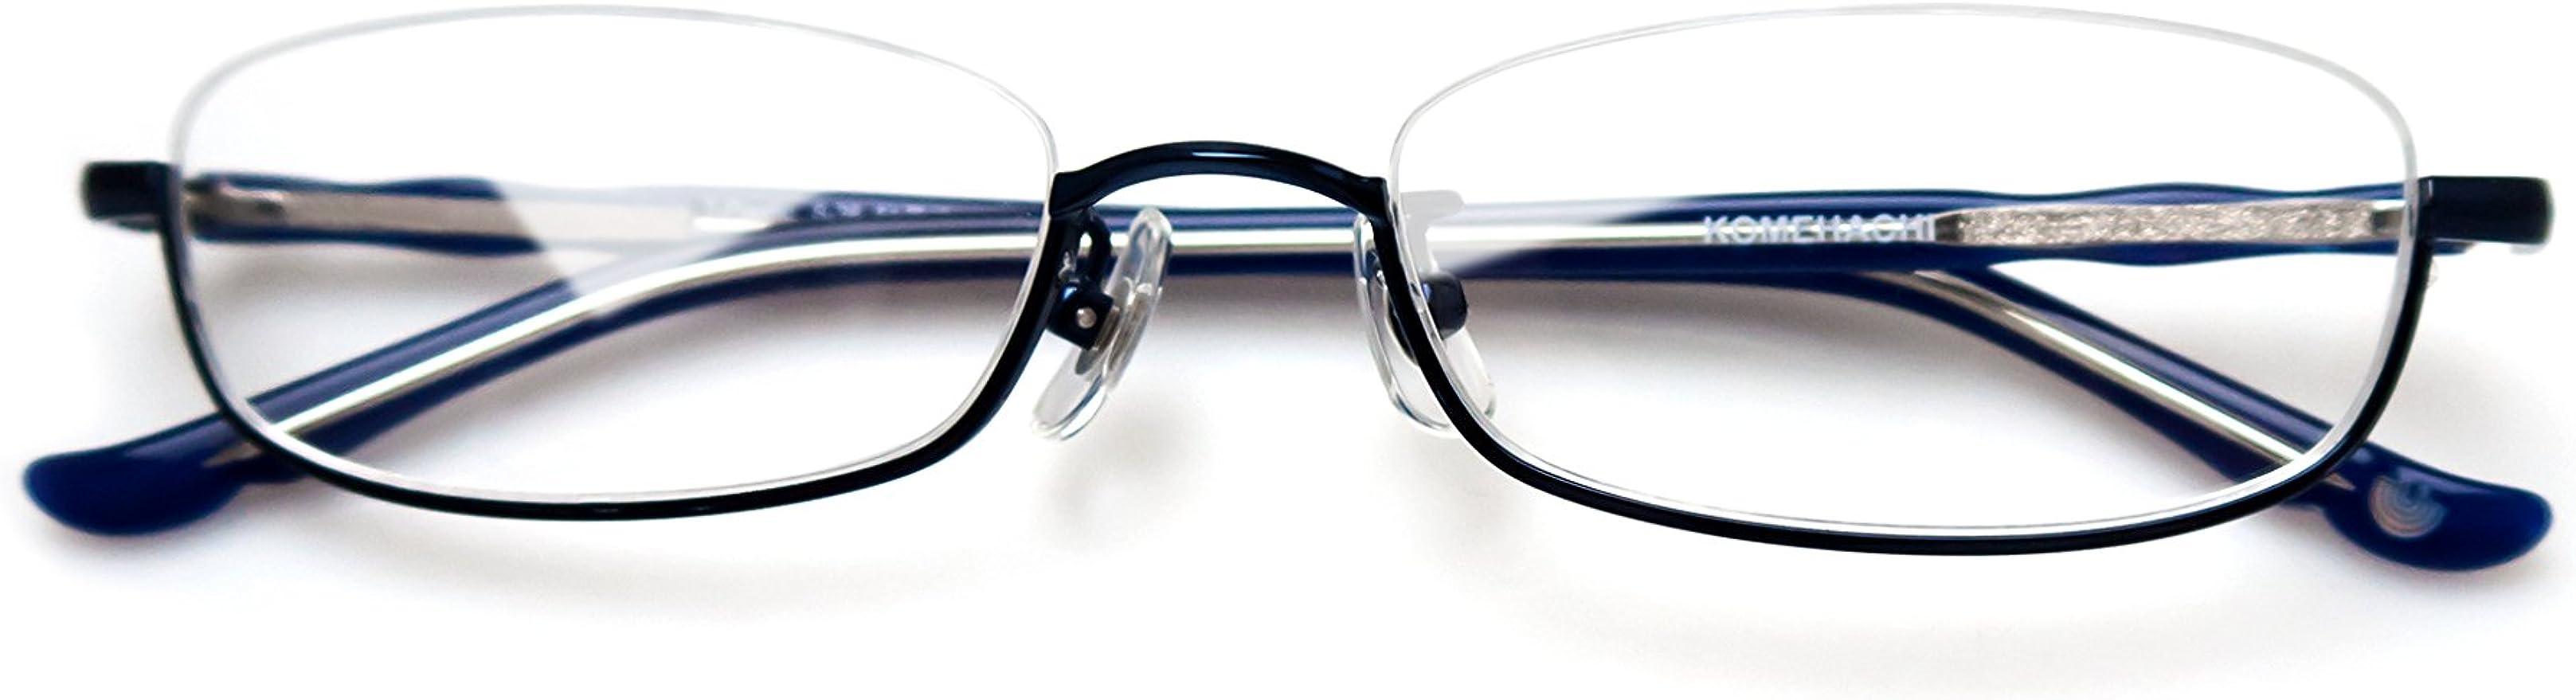 Komehachi Men Rectangle Full Rim Classic Acetate Prescription Ready Clear Lens Eyewear Eyeglasses Frames